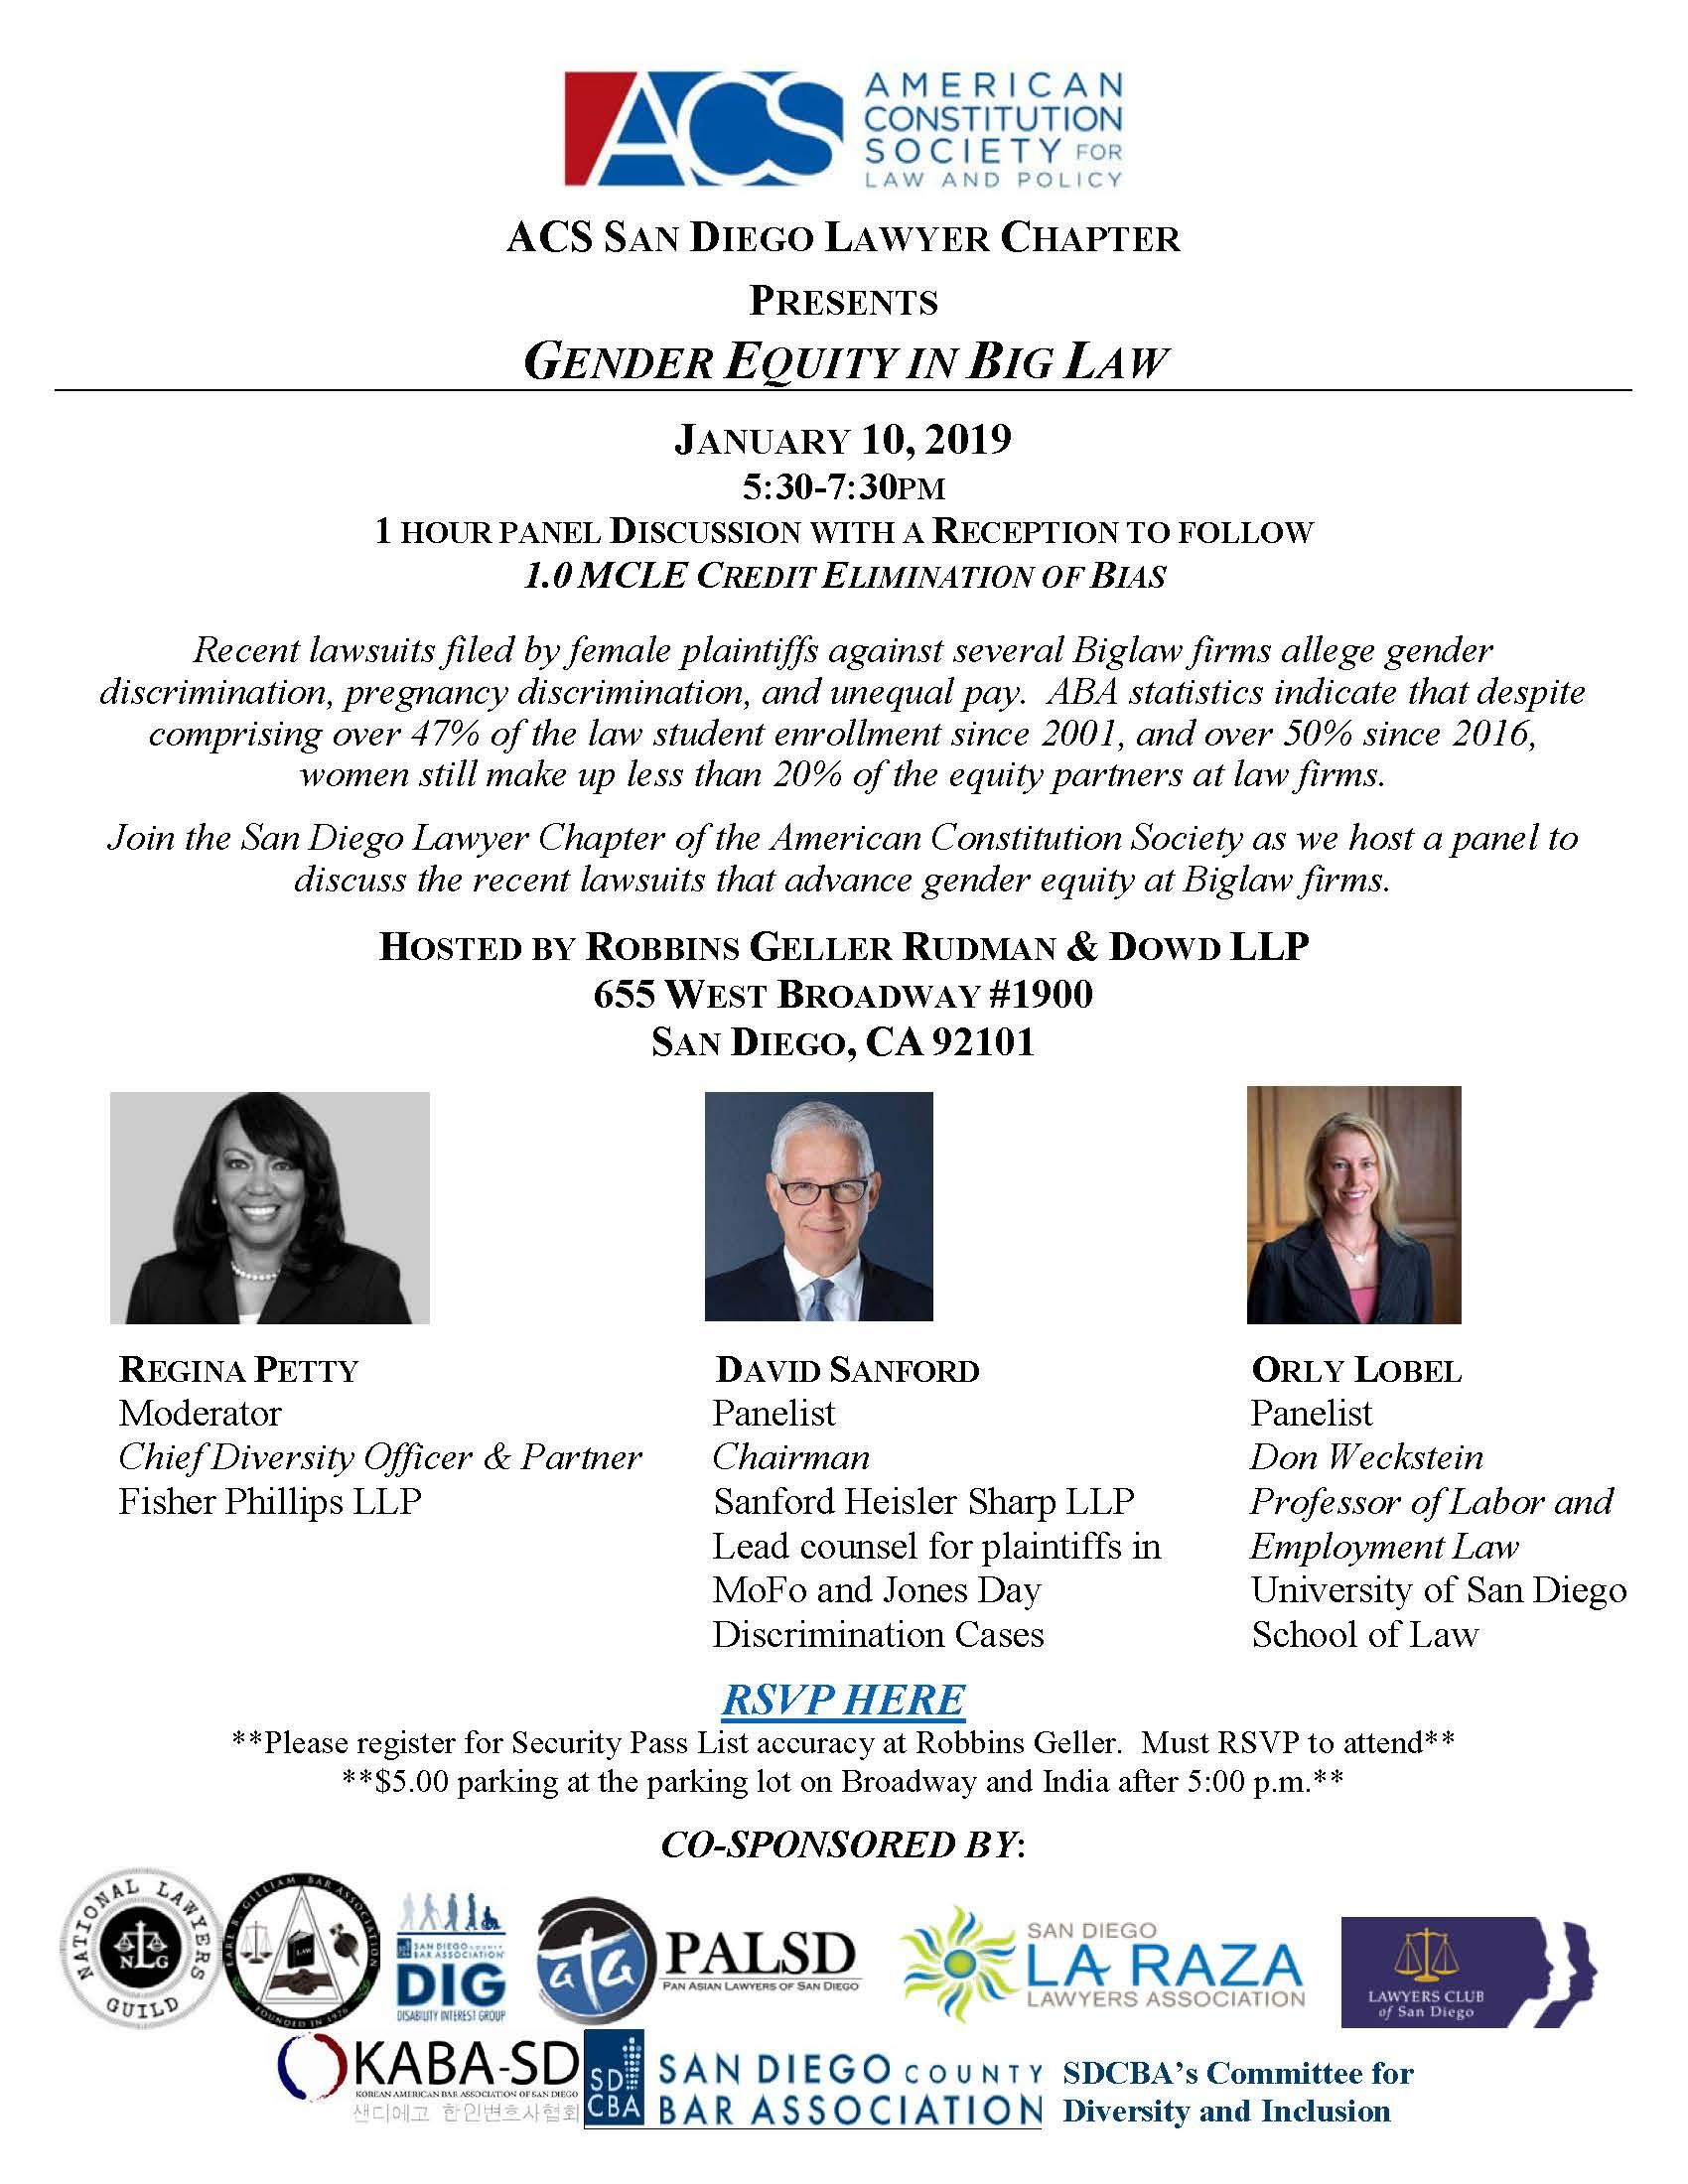 [FINAL] ACS Gender Equity Event set for